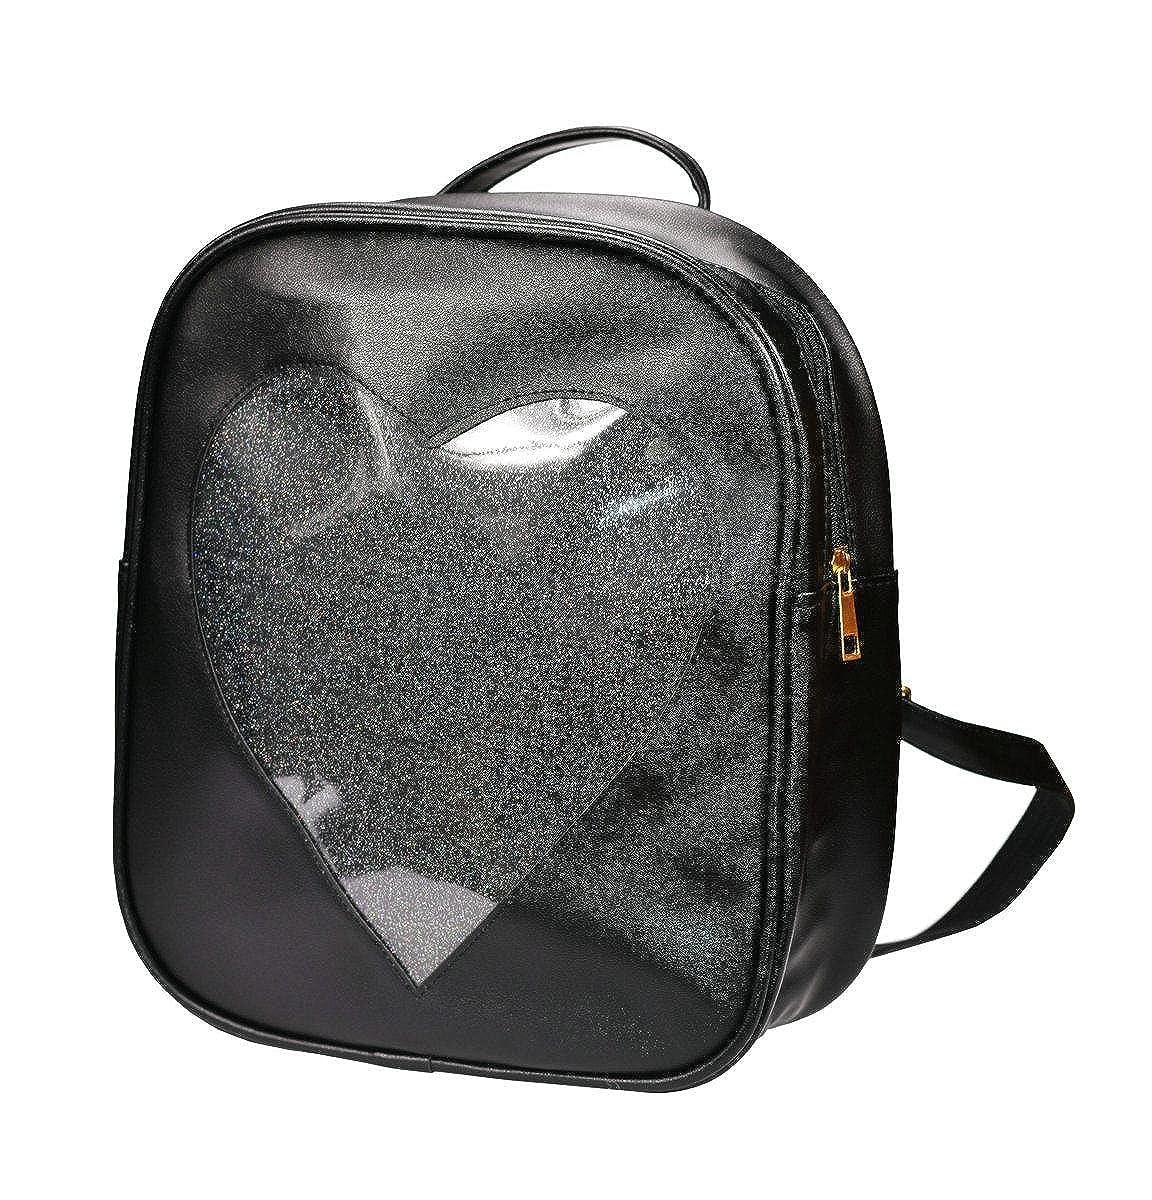 15b8b58de Cute Pins For Backpacks Amazon - CEAGESP